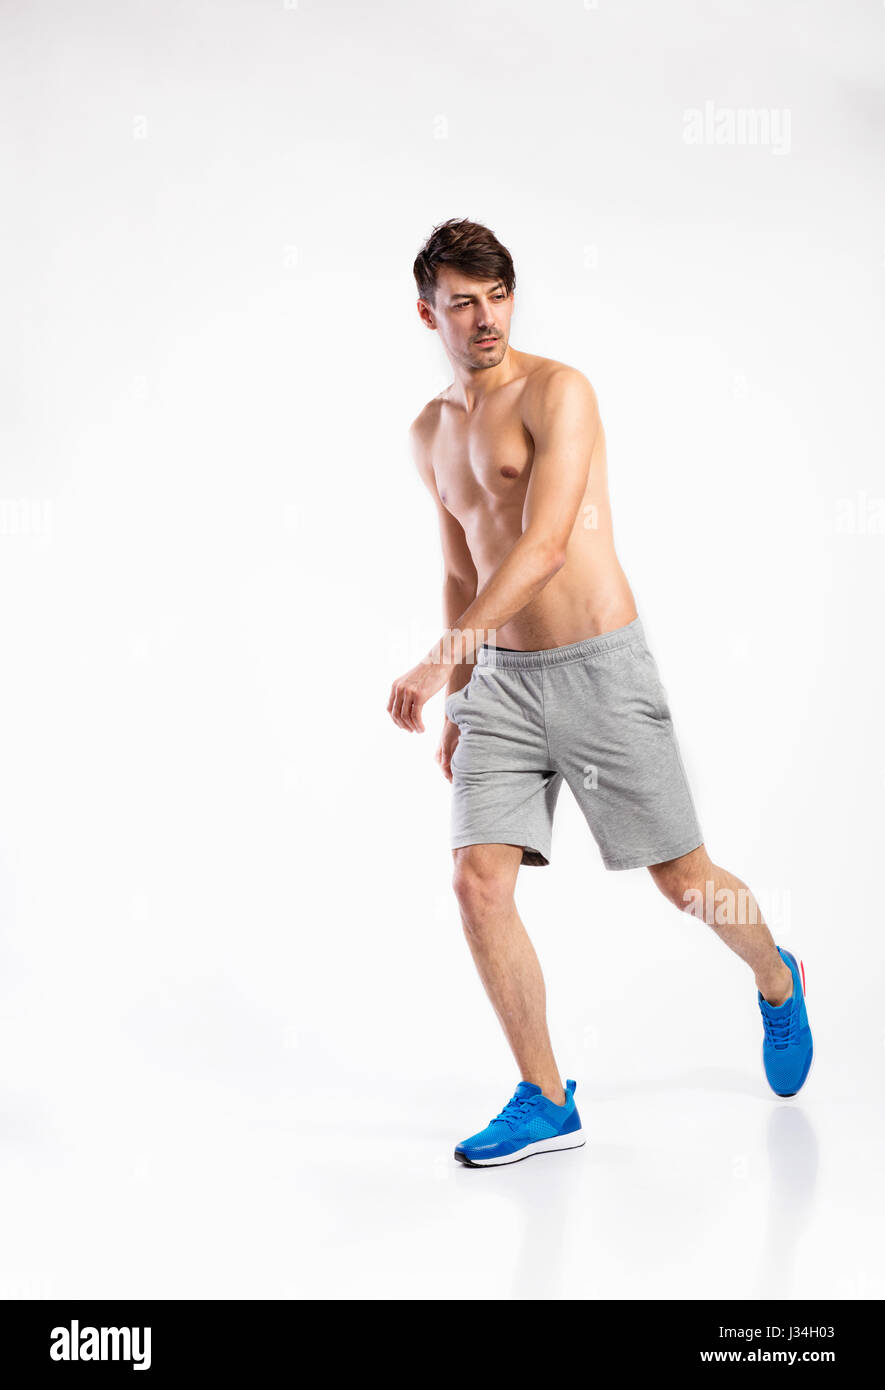 487931b20d6ef Shirtless fitness man in gray shorts. Studio shot. - Stock Image